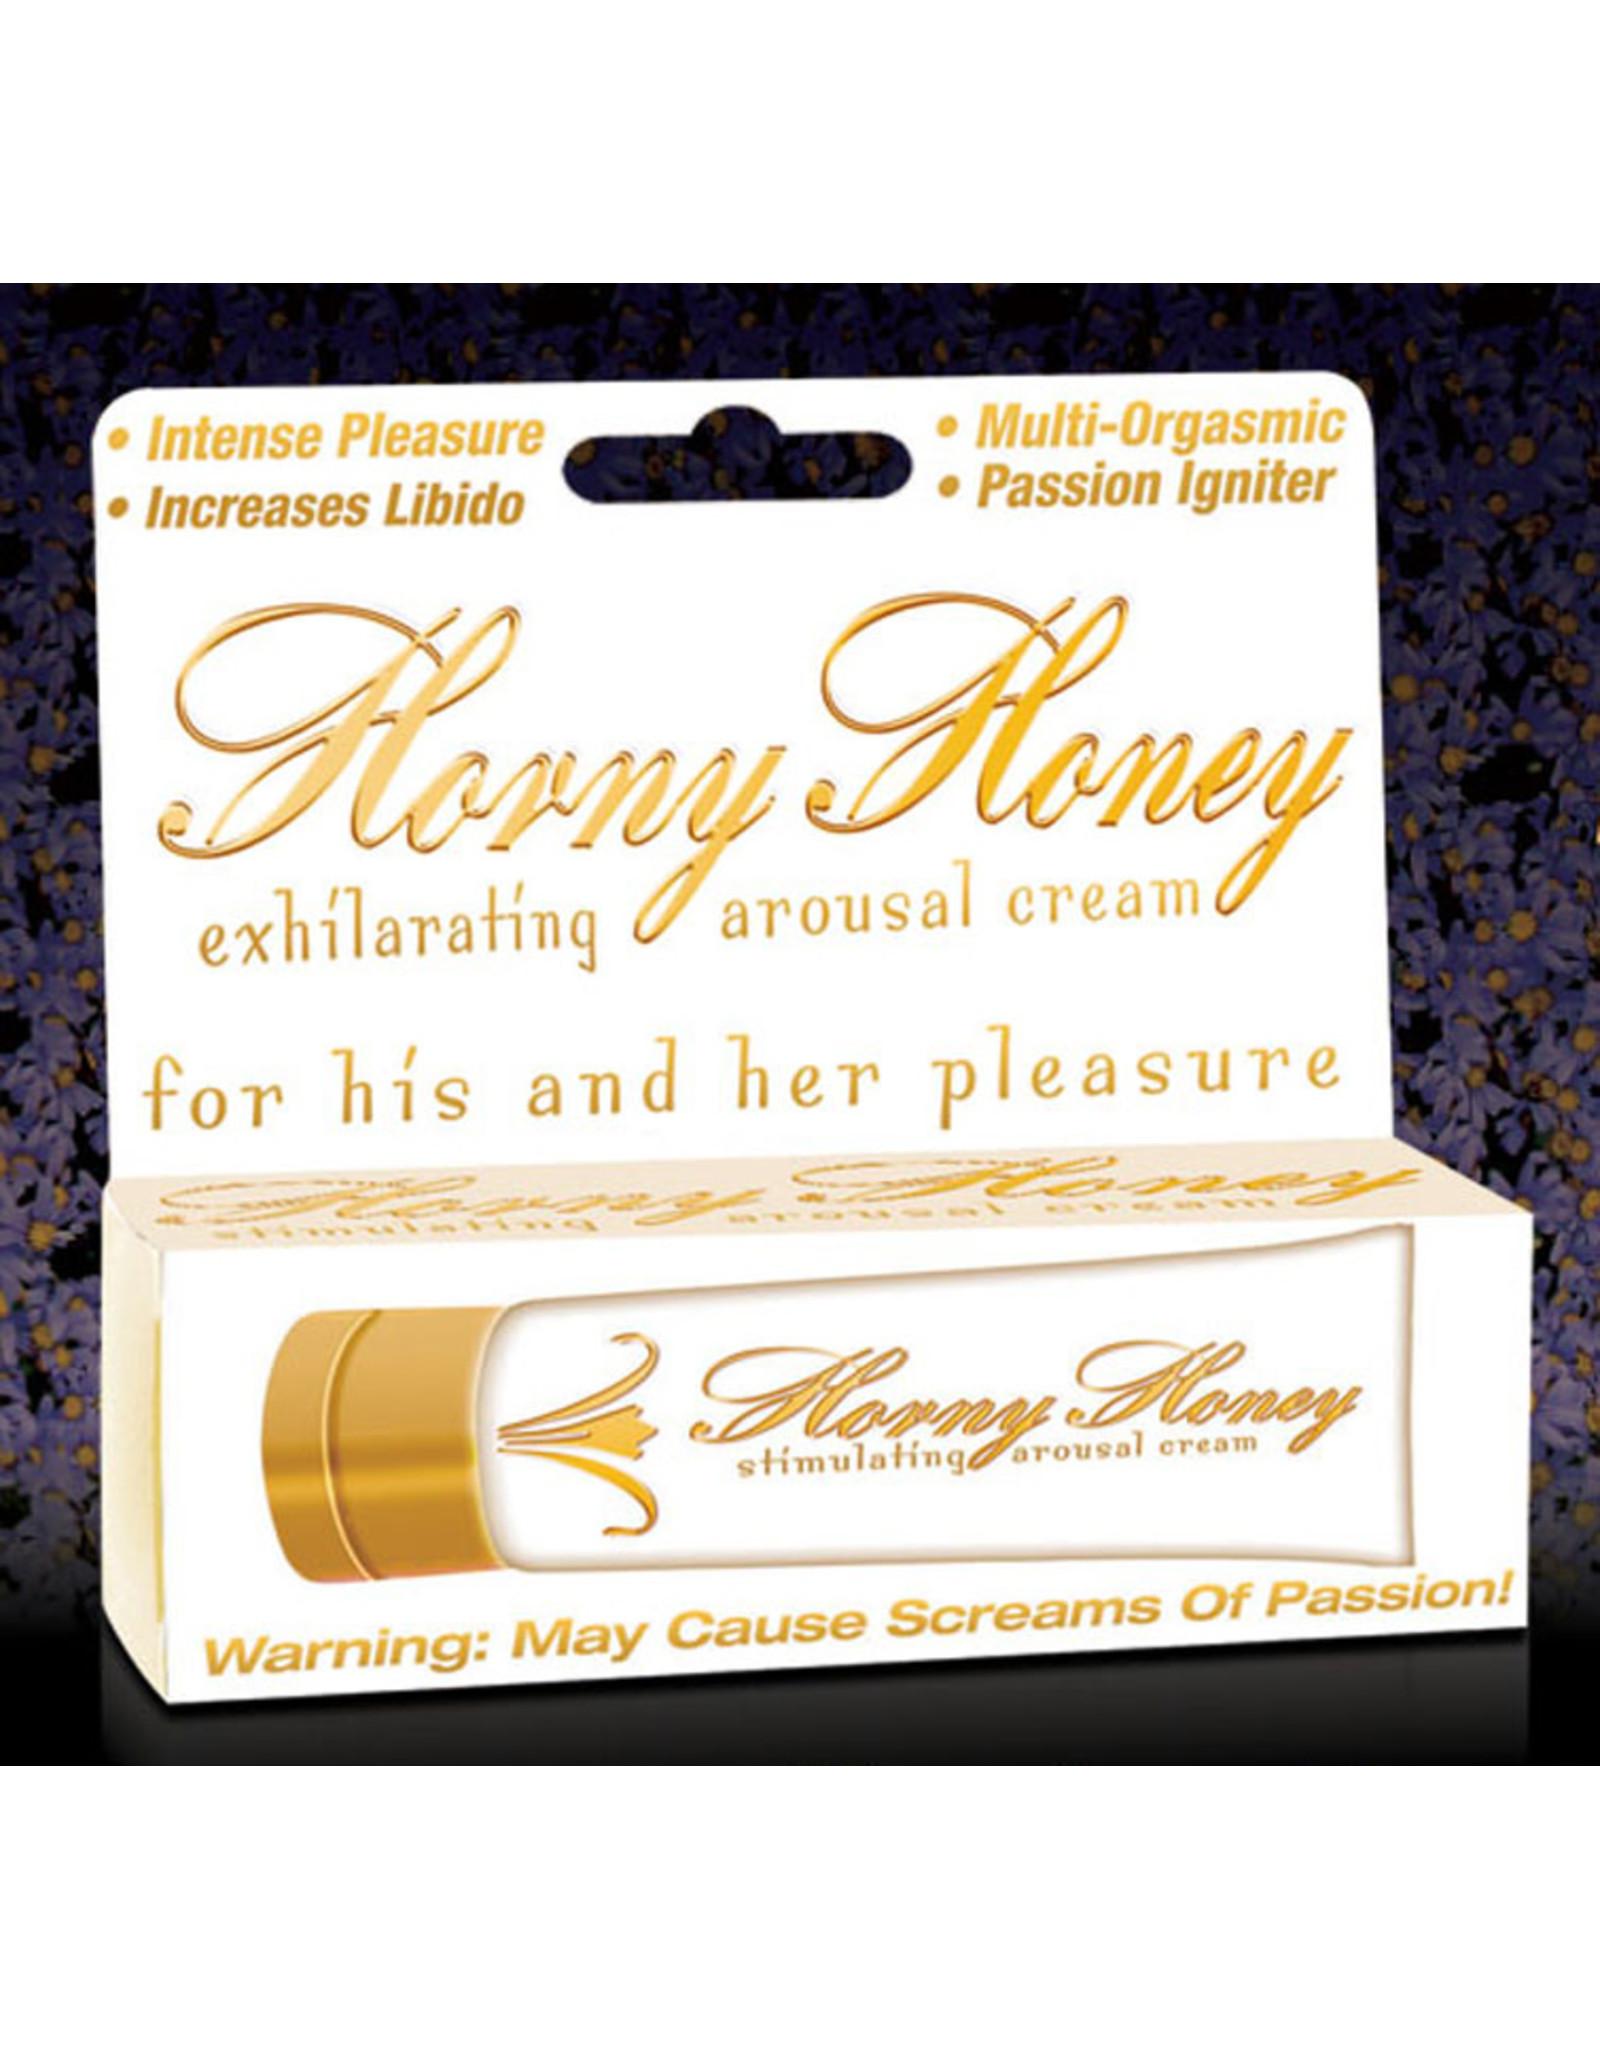 Horny Honey - Exhilarating Arousal Cream 1oz